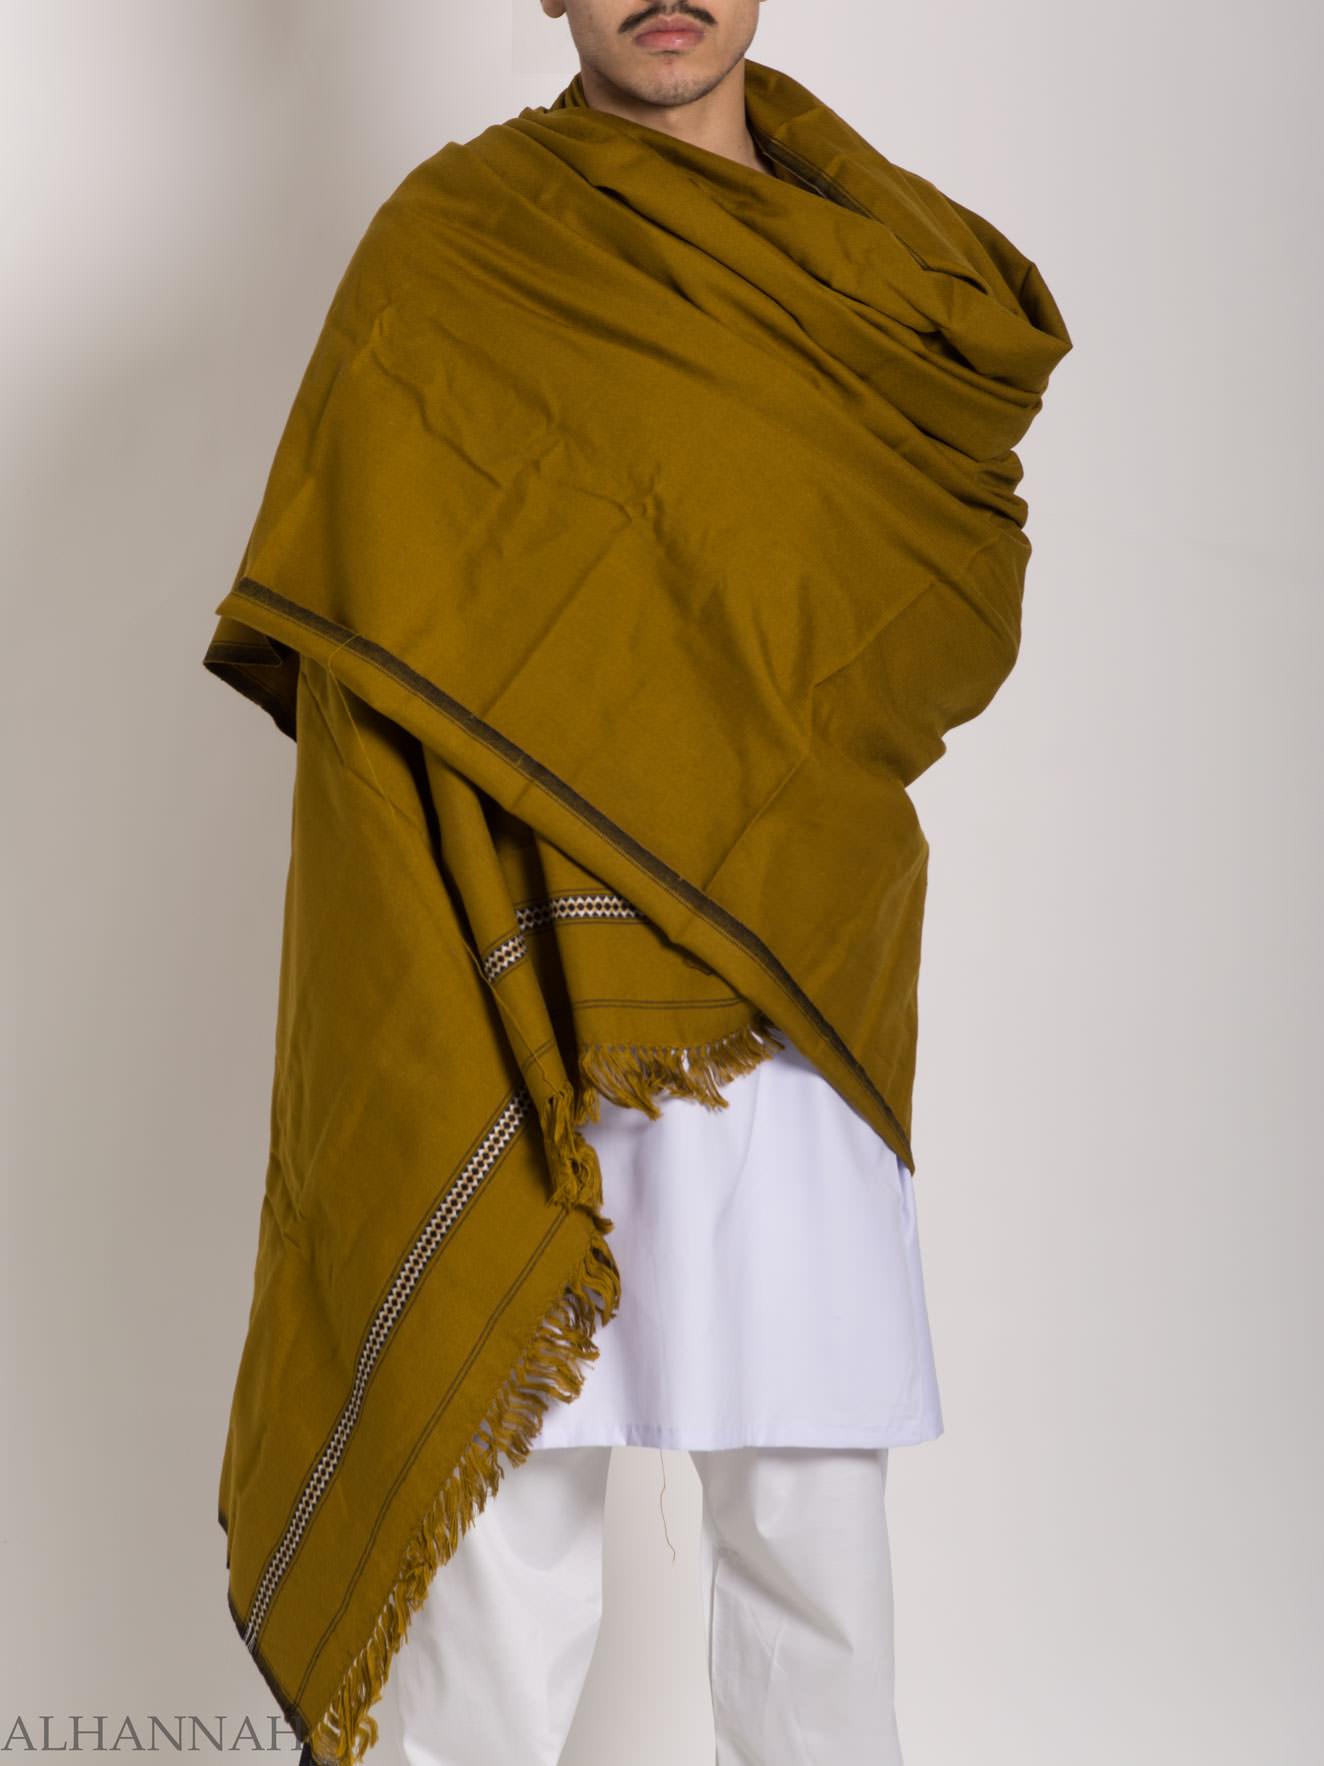 Tasseled Light Wool Pakistani Shawl With Ethnic Triangle